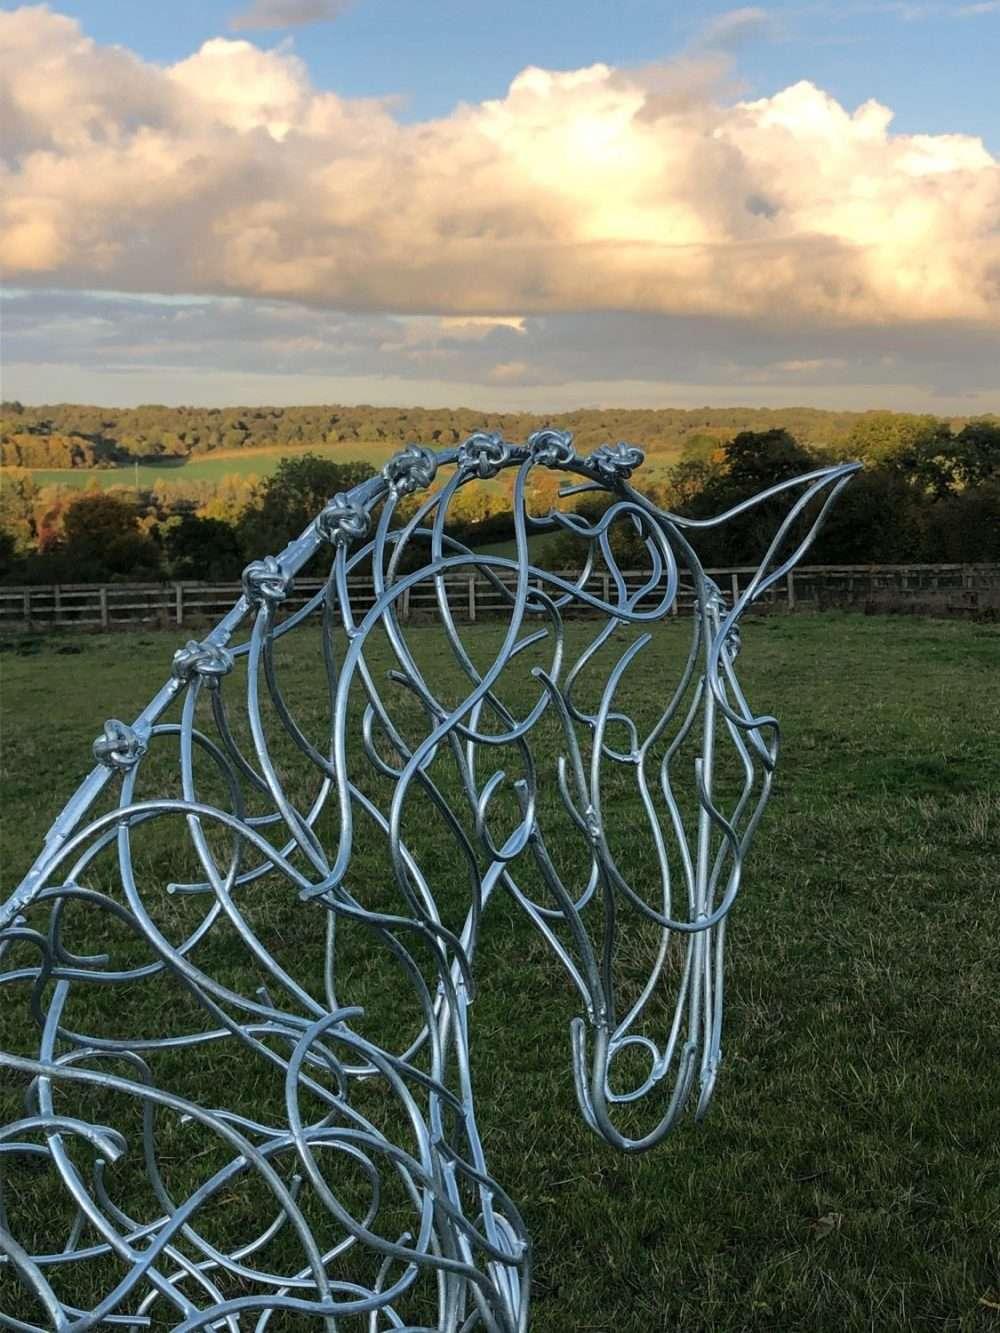 Dressage Horse Sculpture At Dusk